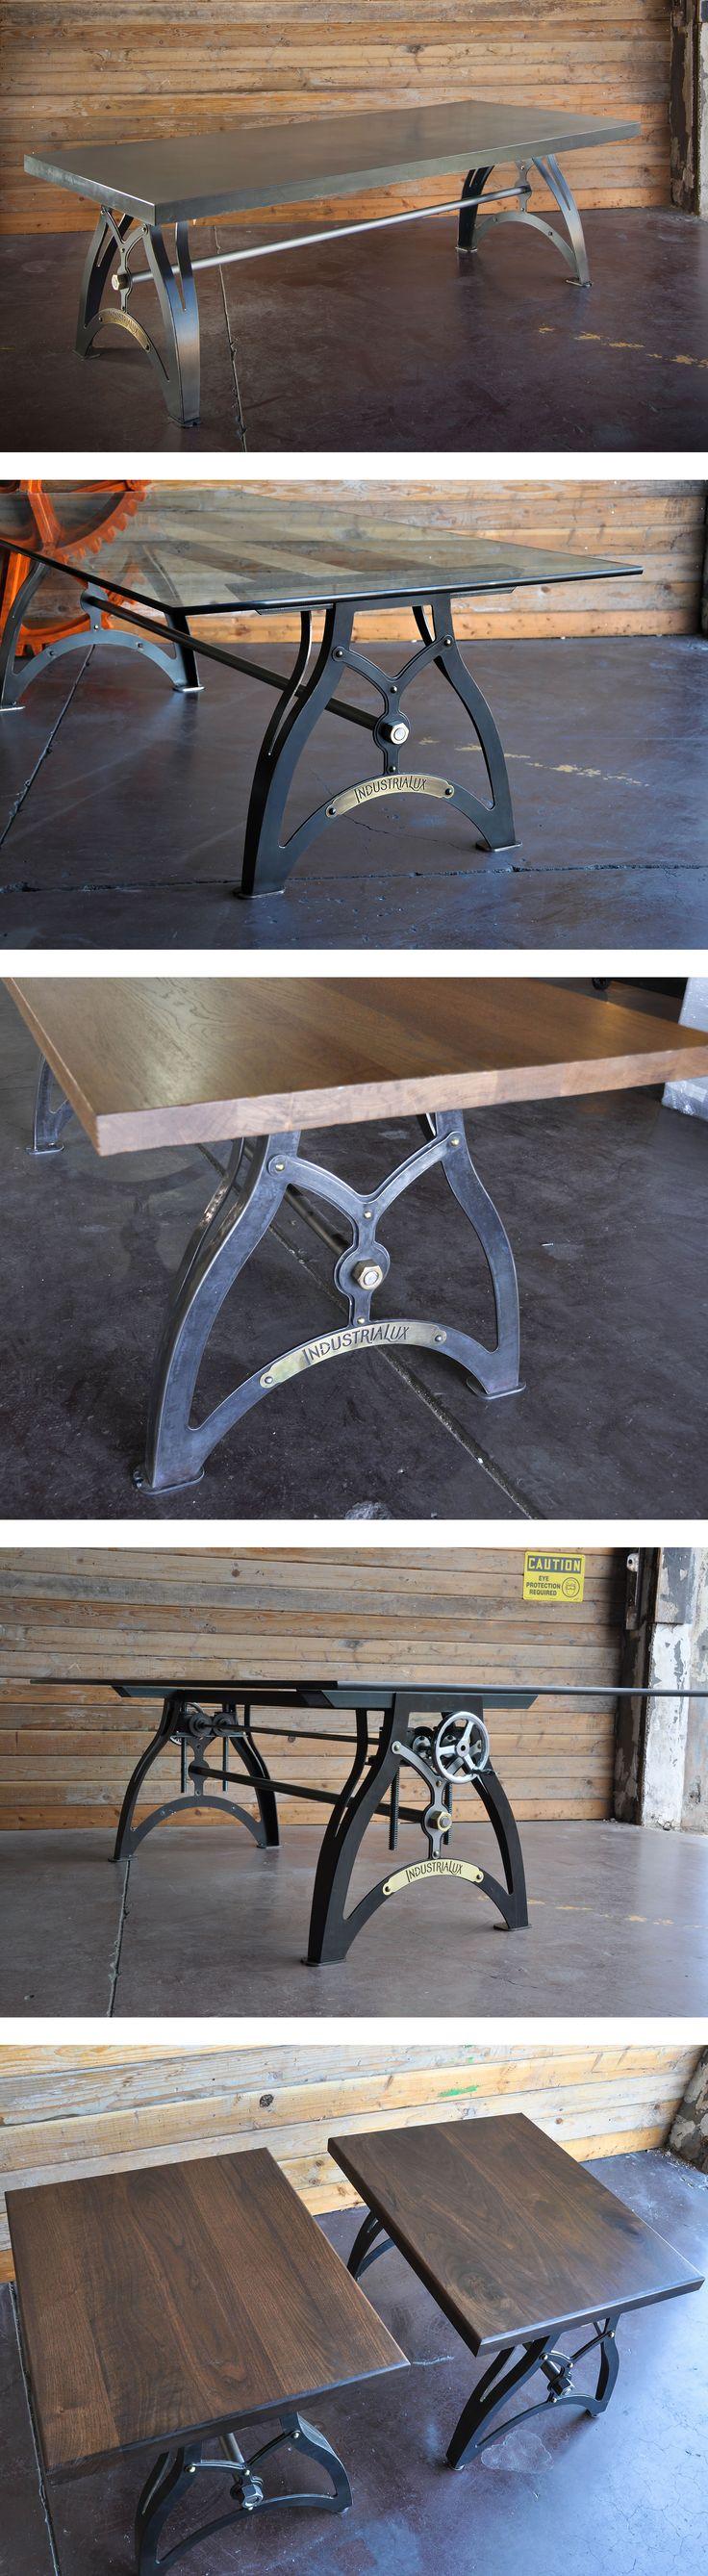 IndustriaLux Tables by Vintage Industrial Furniture  in Phoenix, AZ